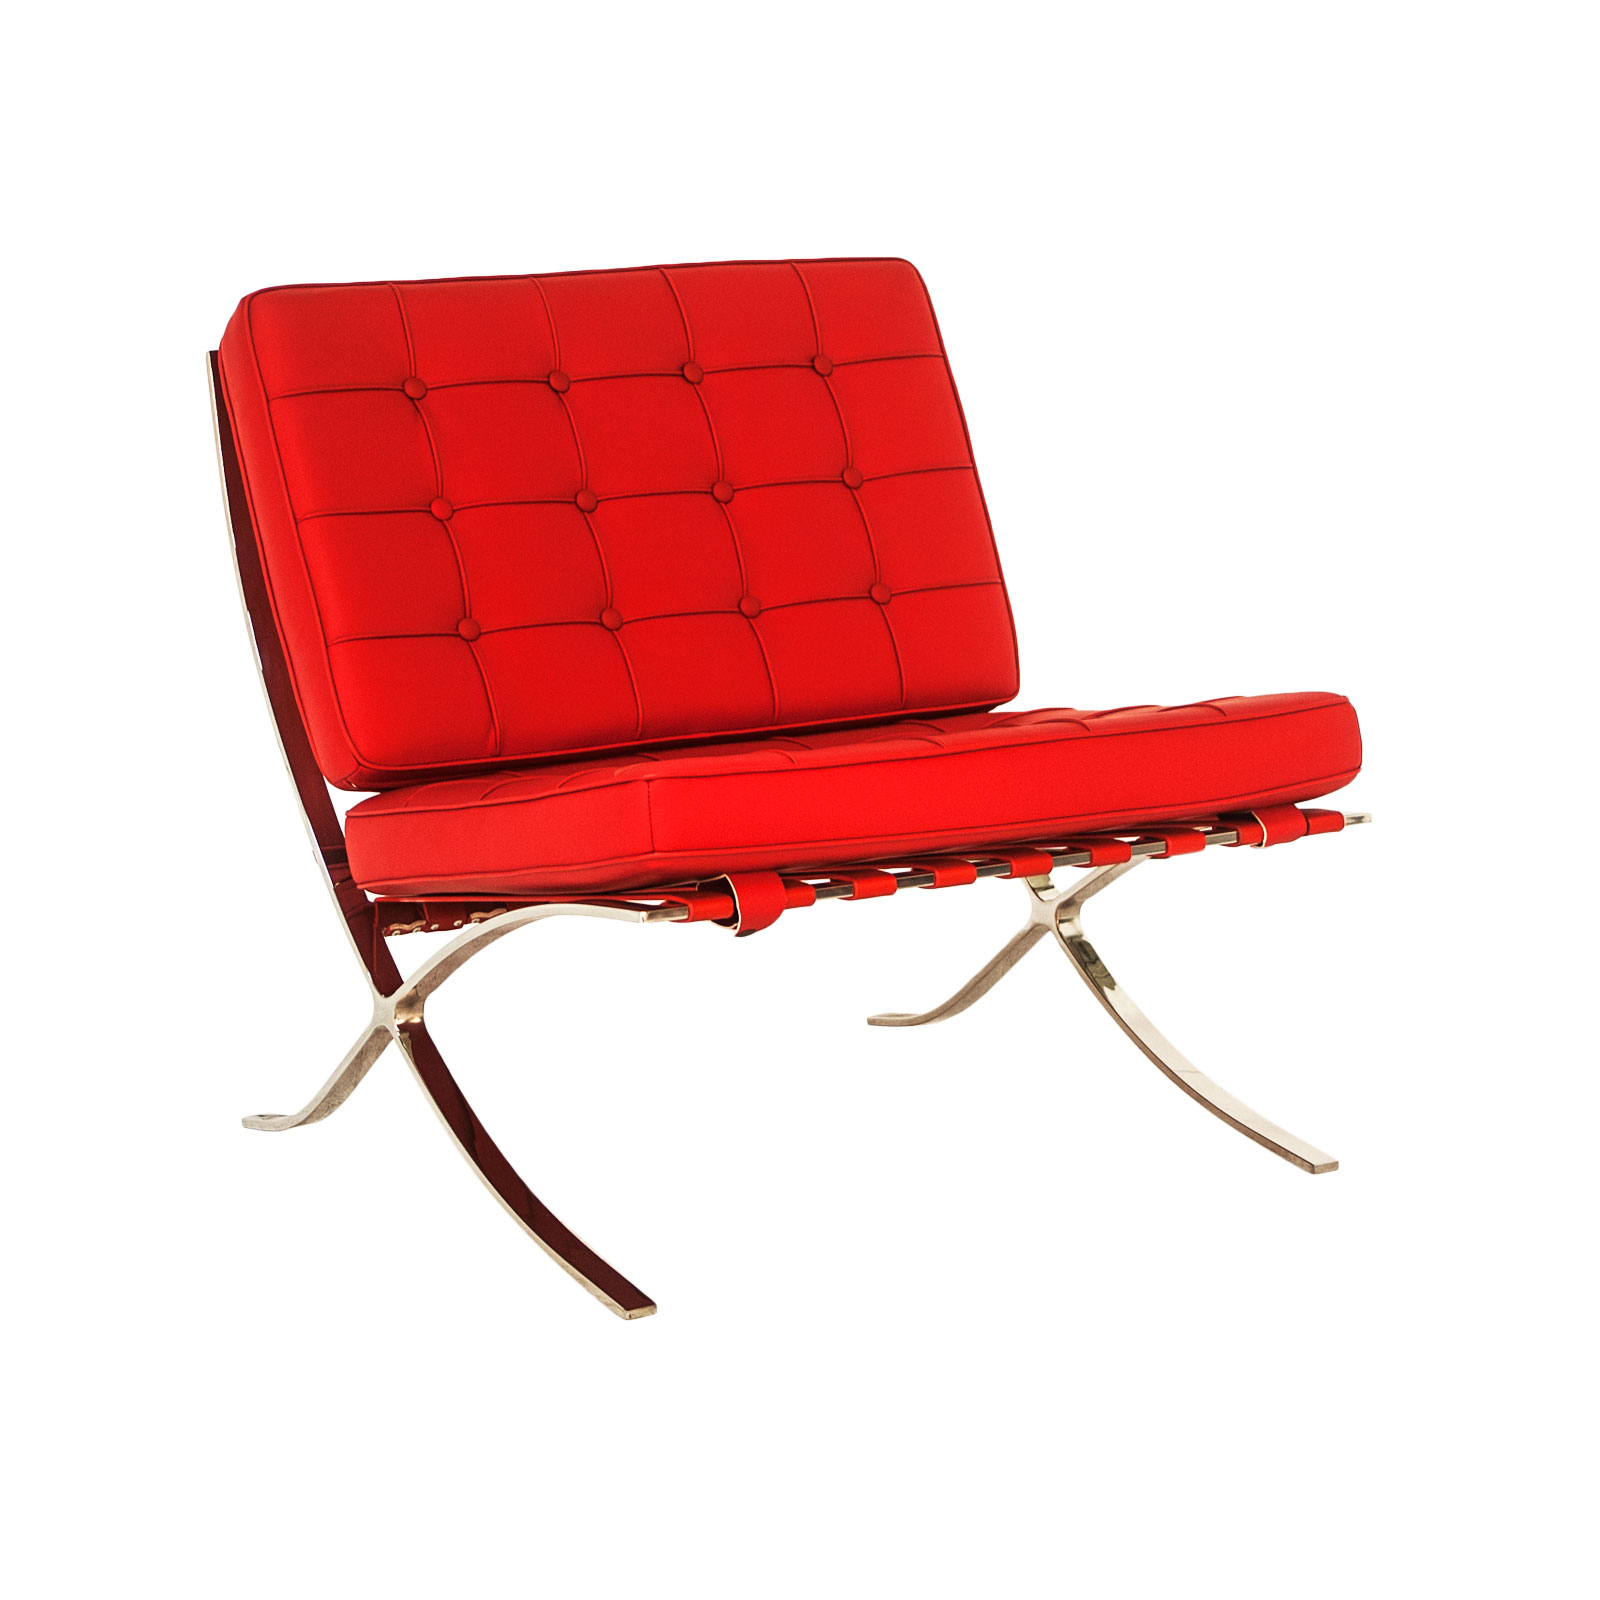 Awe Inspiring Barcelona Lounge Chair Rentals Mies Van Der Rohe Machost Co Dining Chair Design Ideas Machostcouk